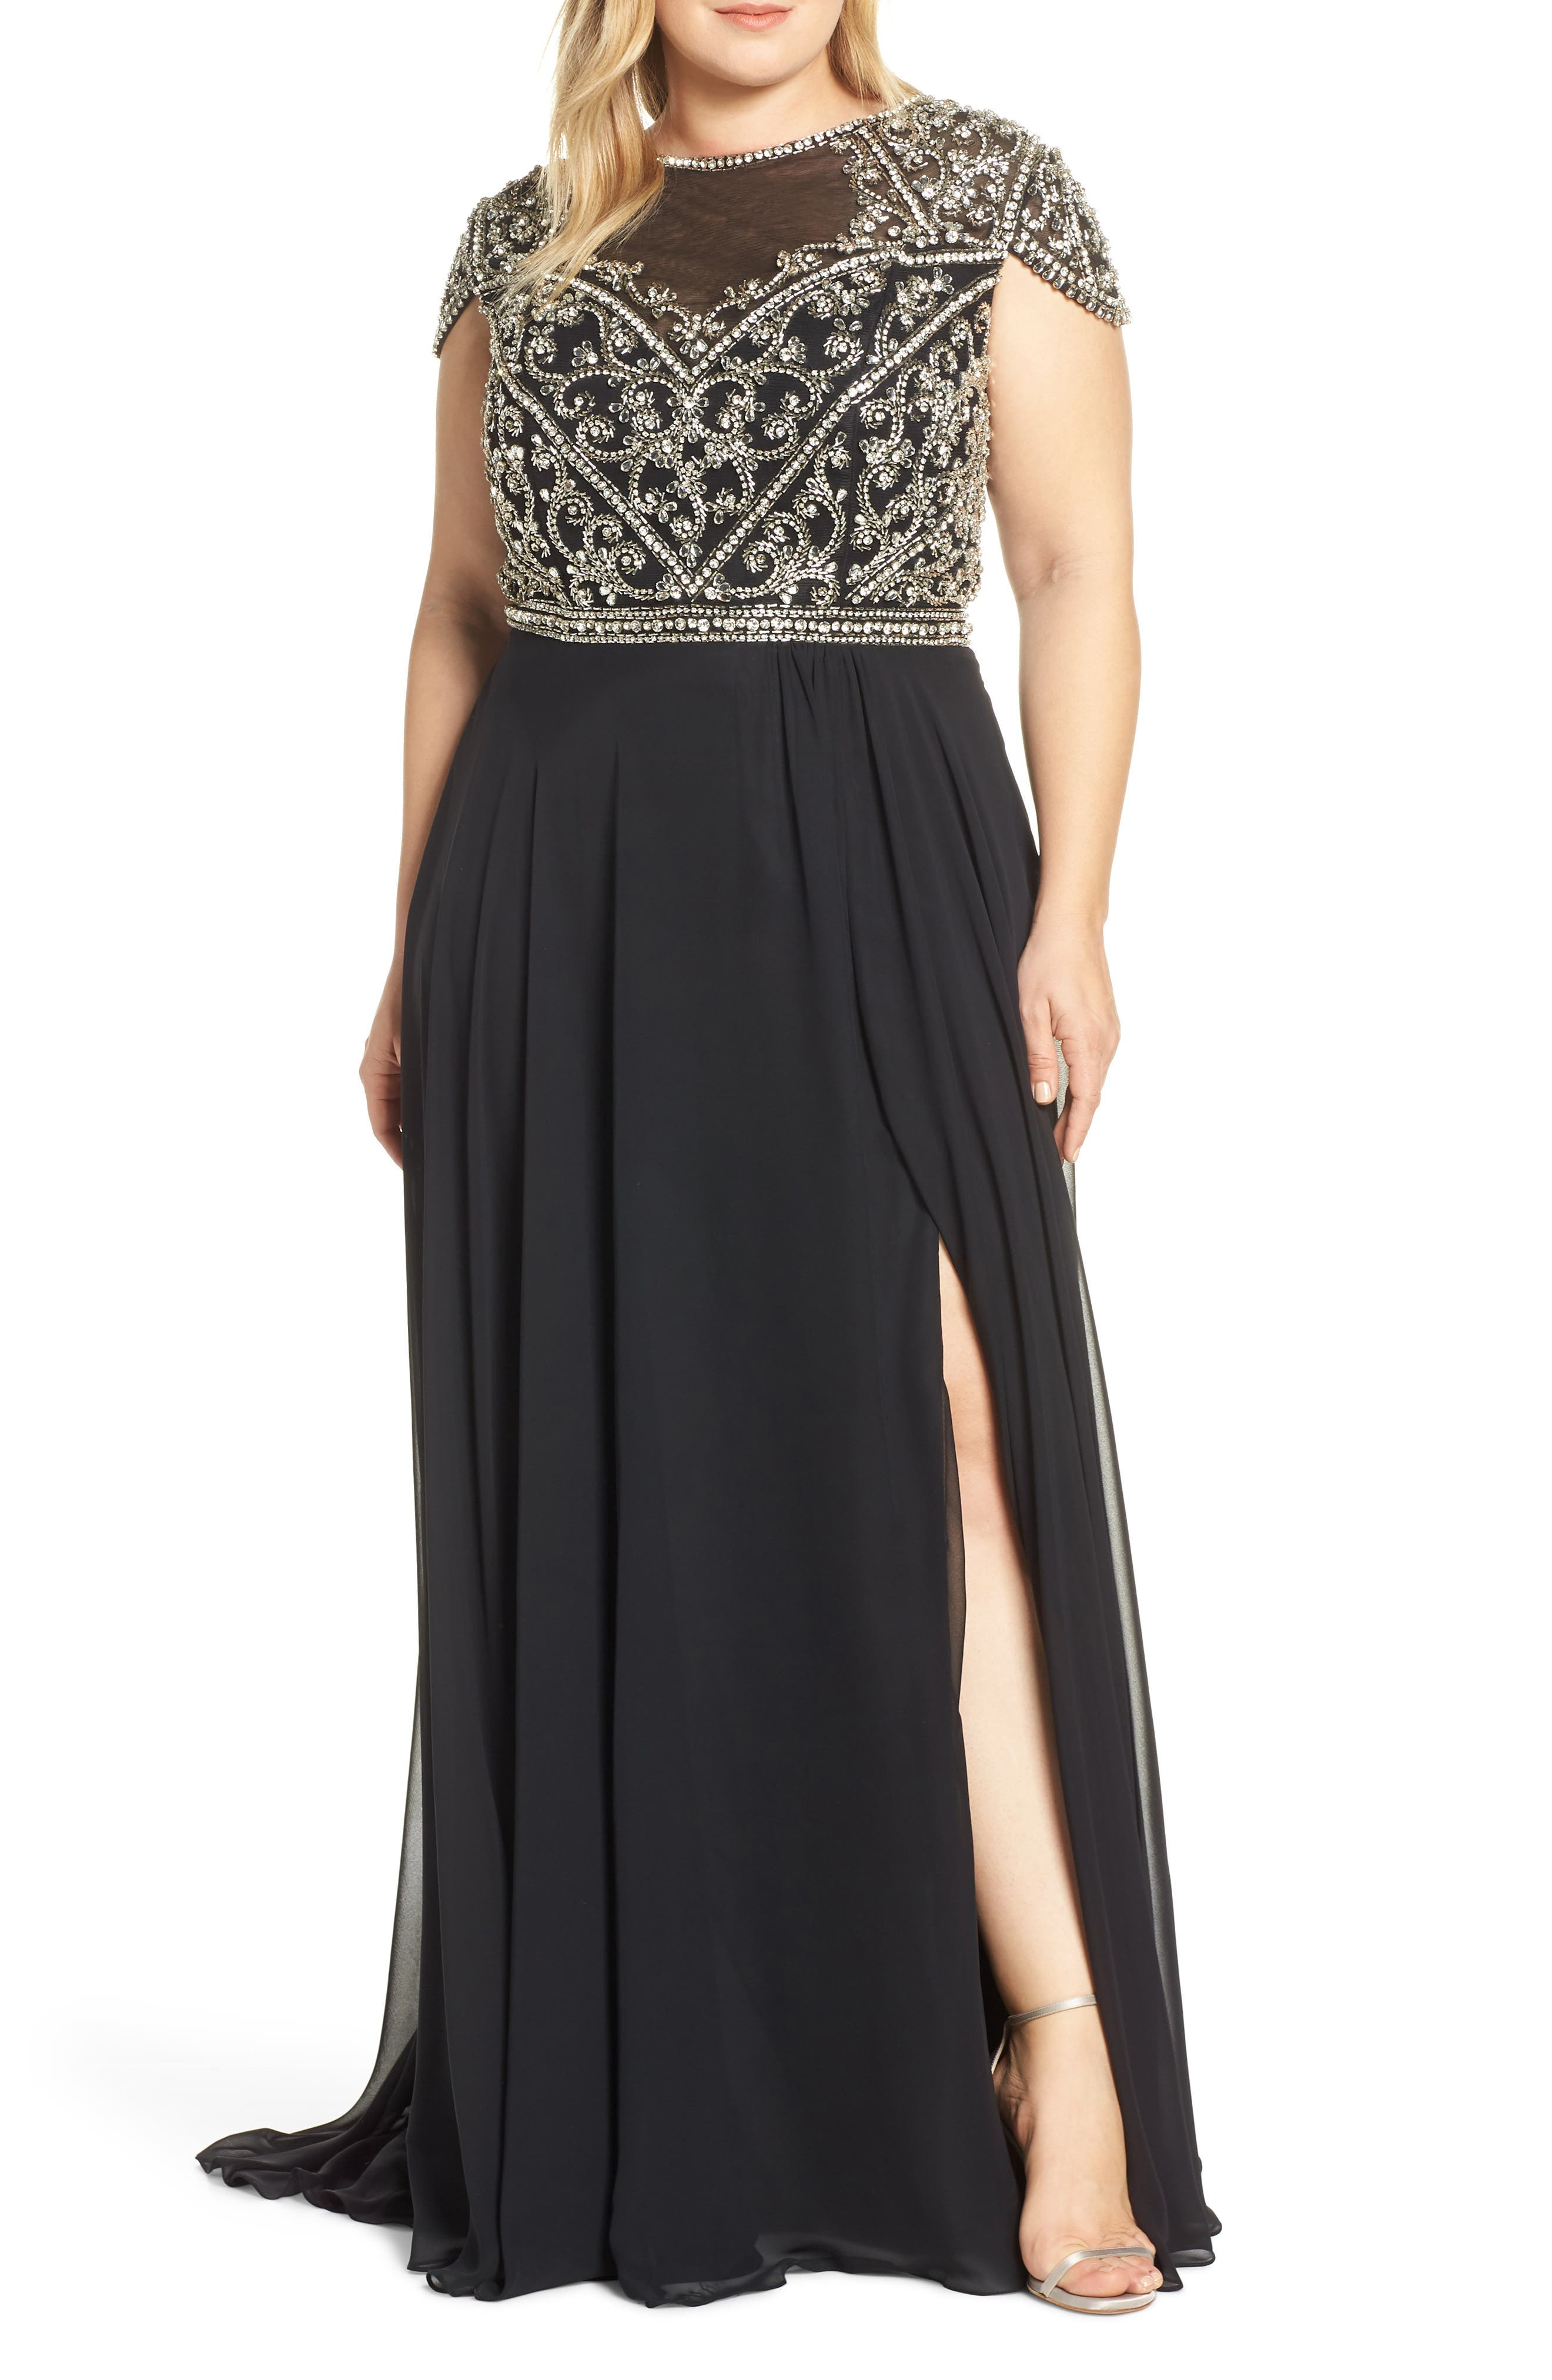 Plus Size MAC Duggal Embellished Bodice Evening Dress, Black